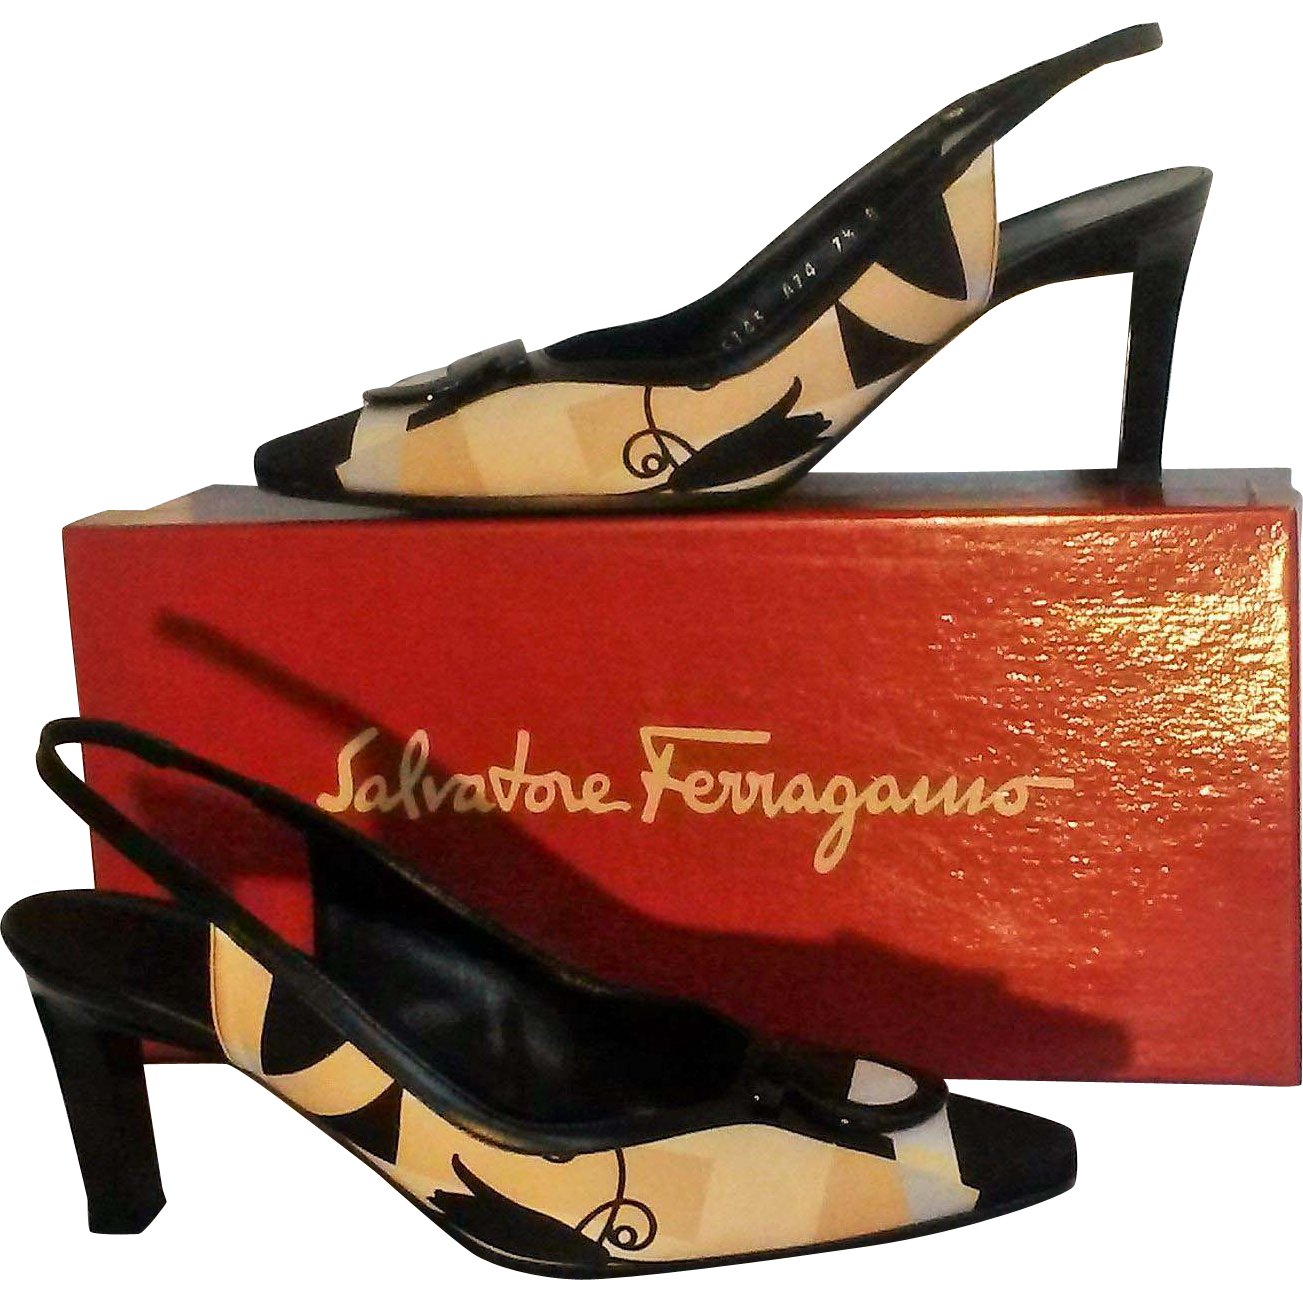 Salvatore Ferragamo Damietta sling back shoes Gancini Mod graphic fabric